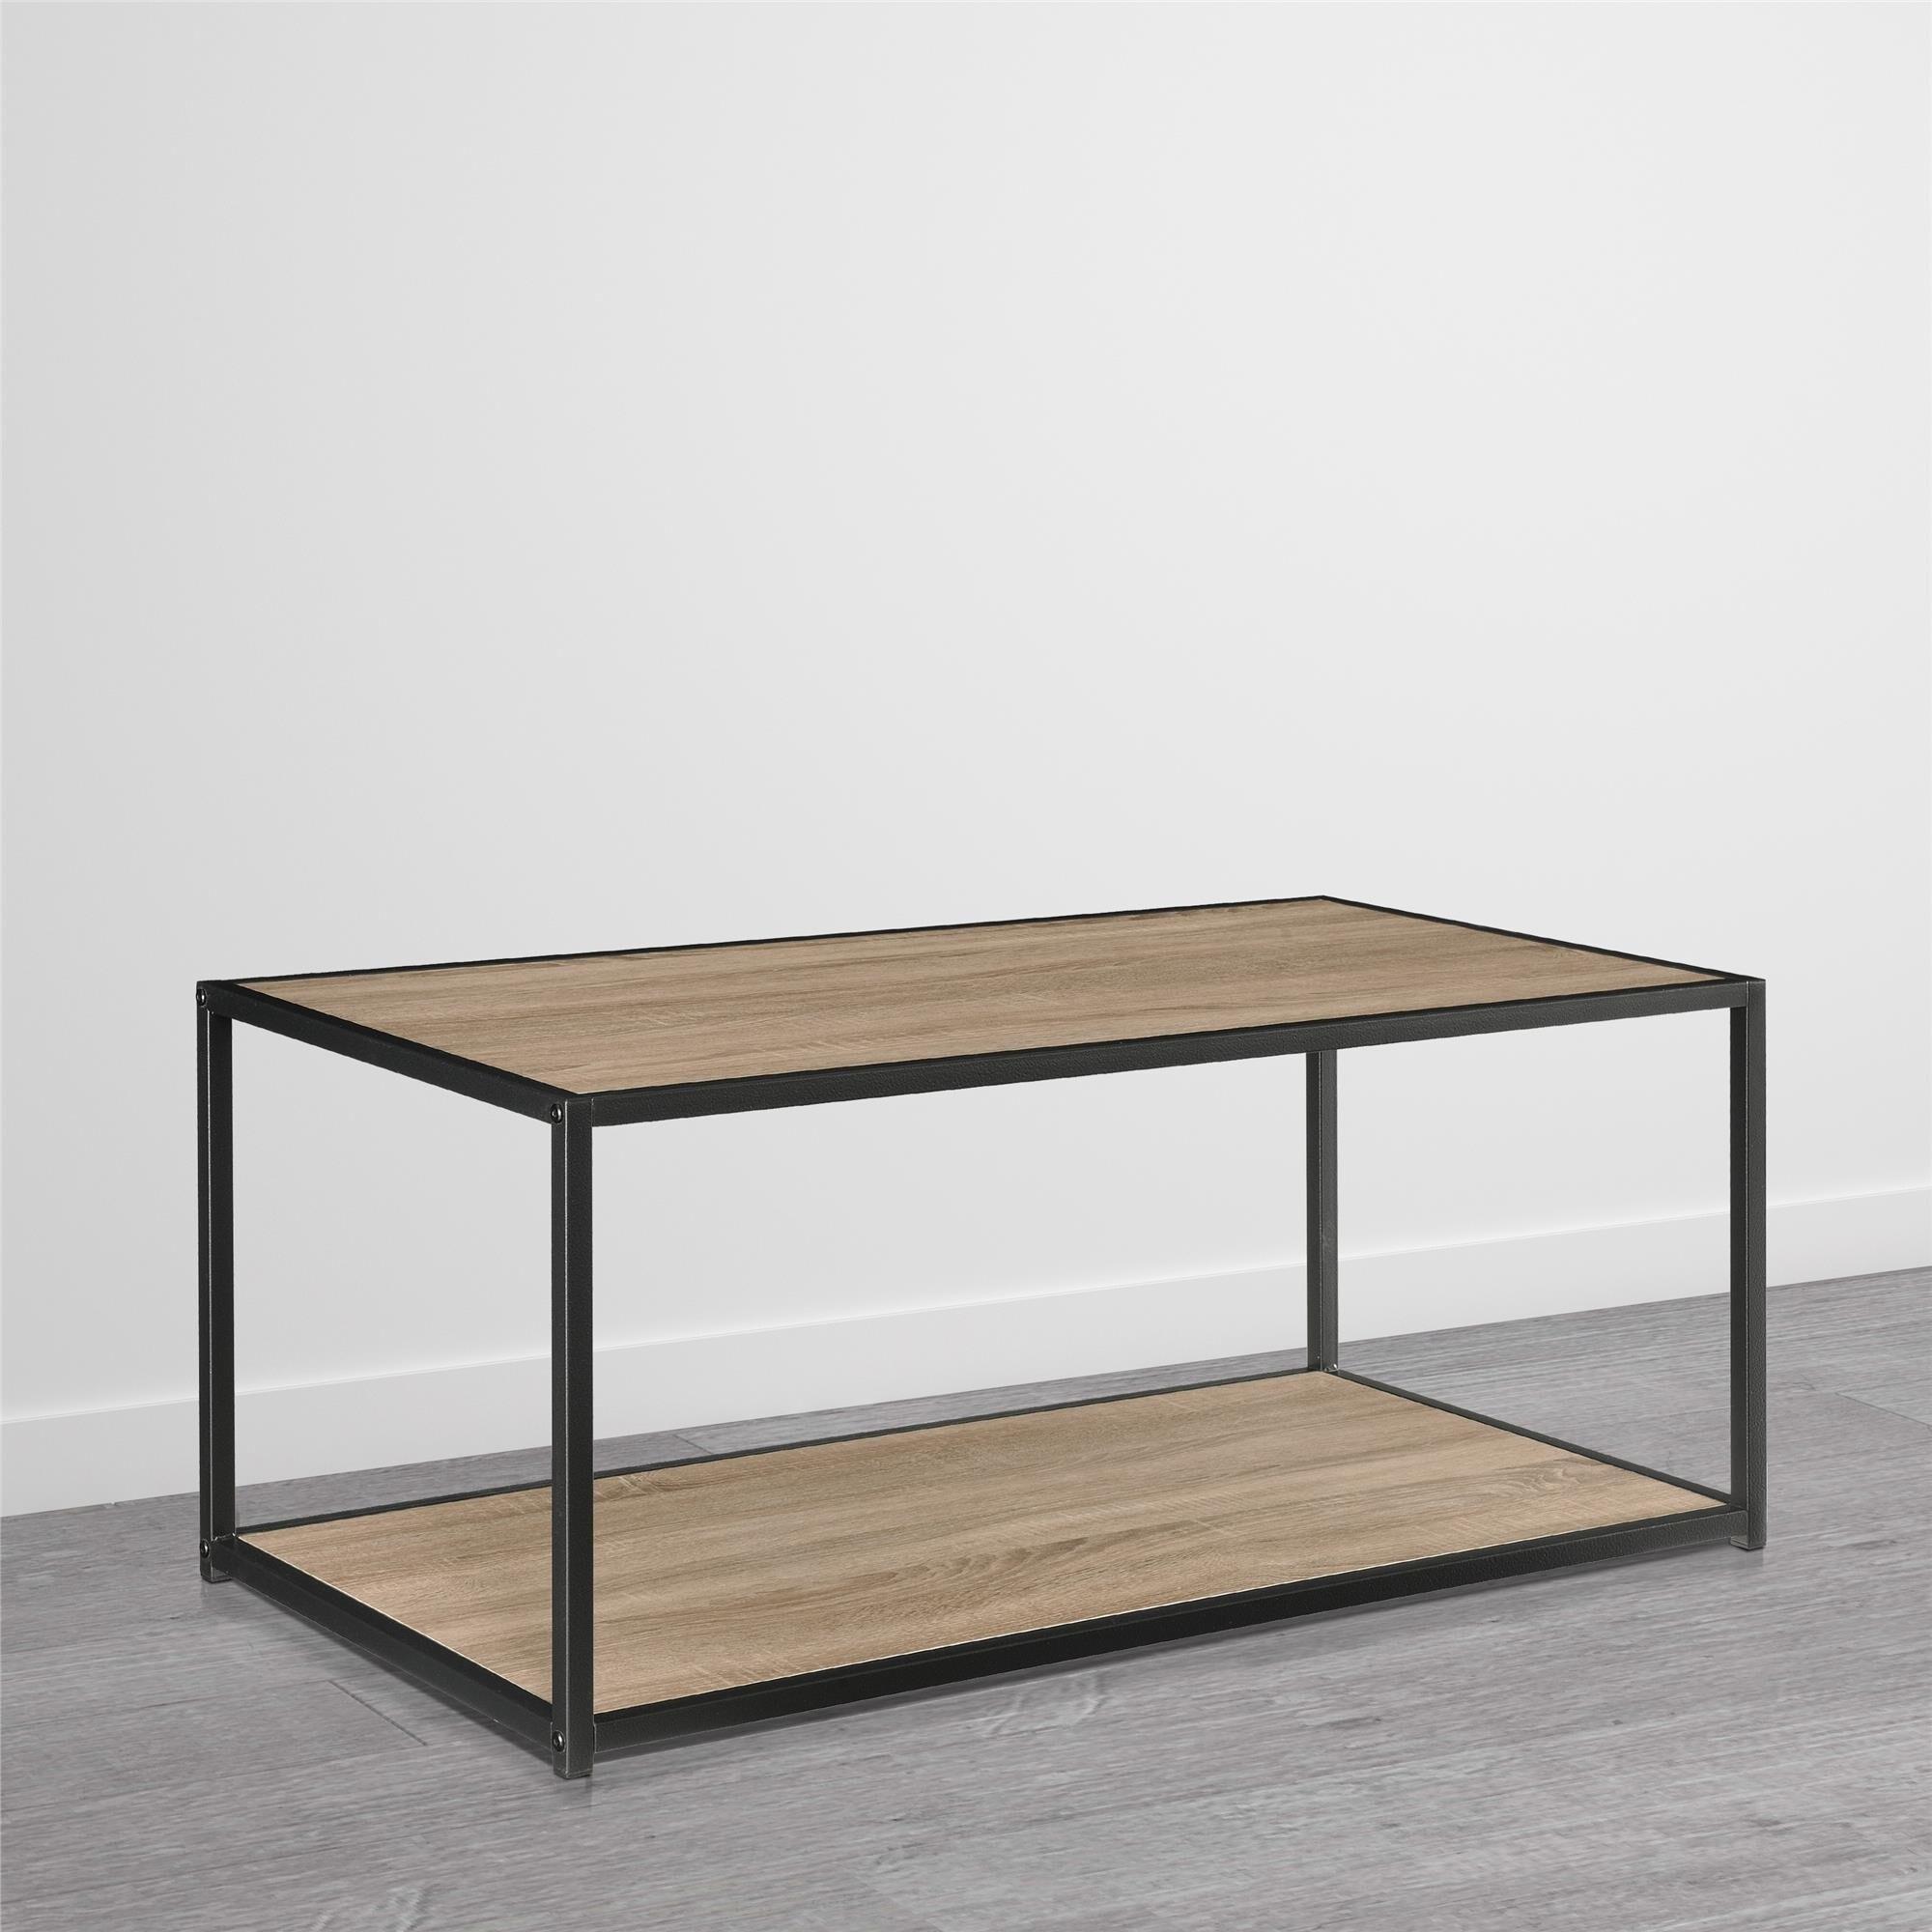 Porch & Den Wicker Park Haddon Metal Frame Coffee Table Free